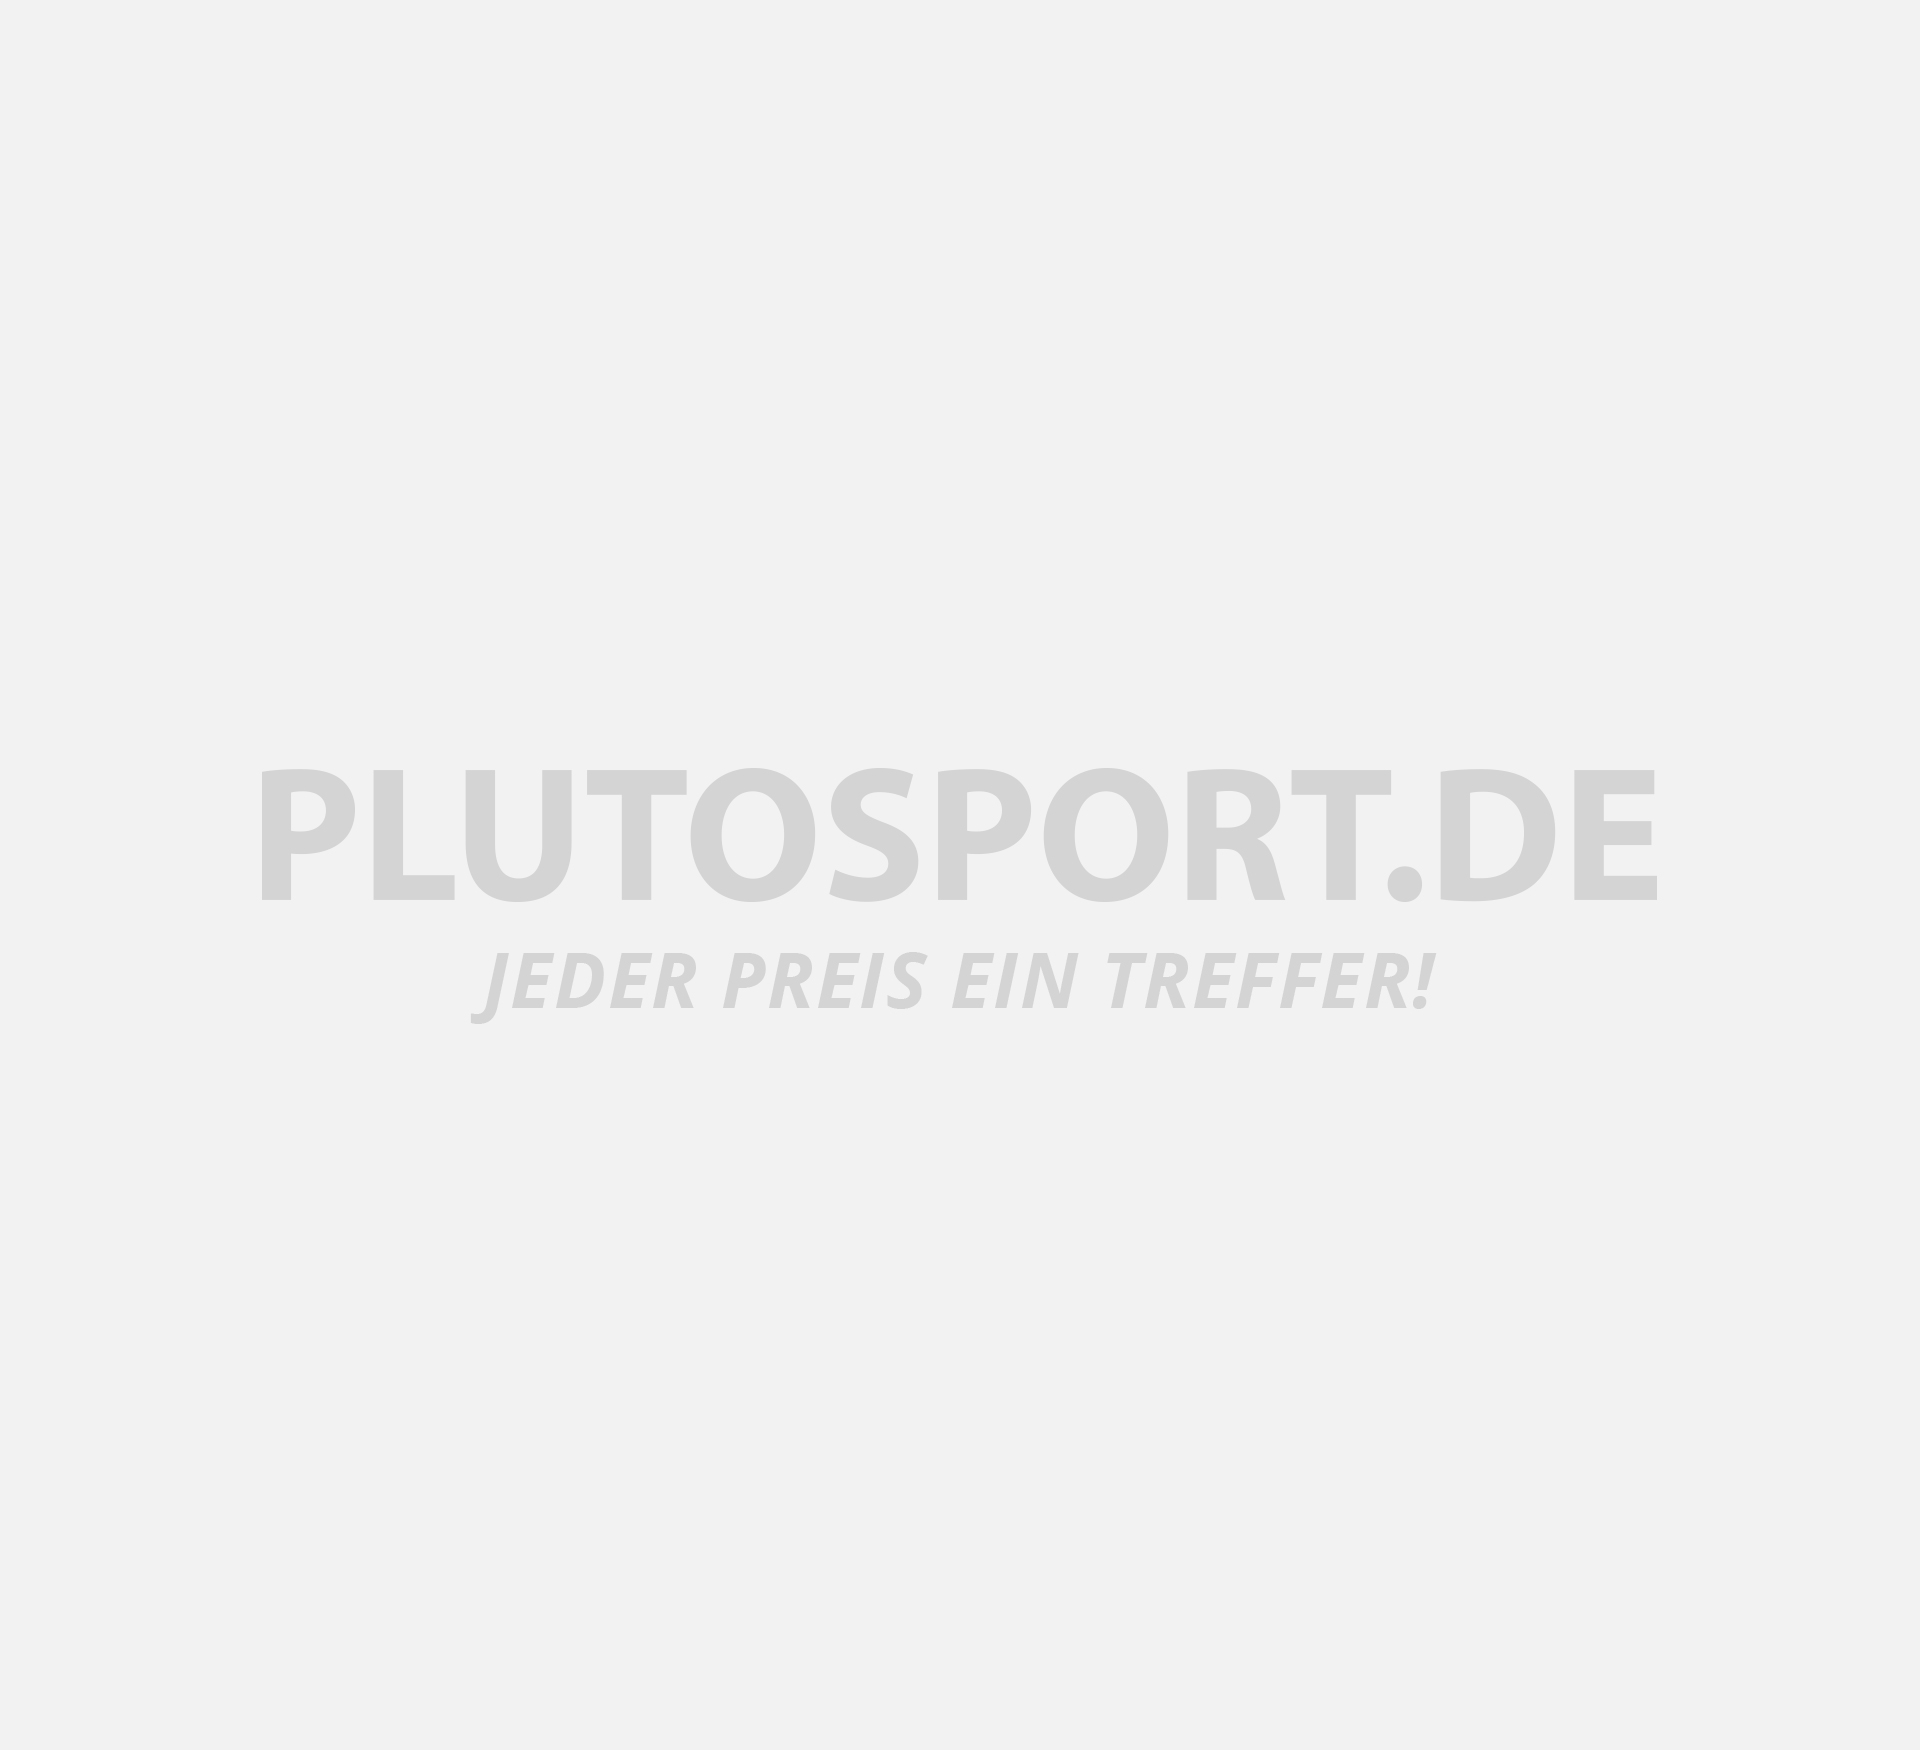 Reusch Attrakt Solid Torwarthandschuhe Kinder